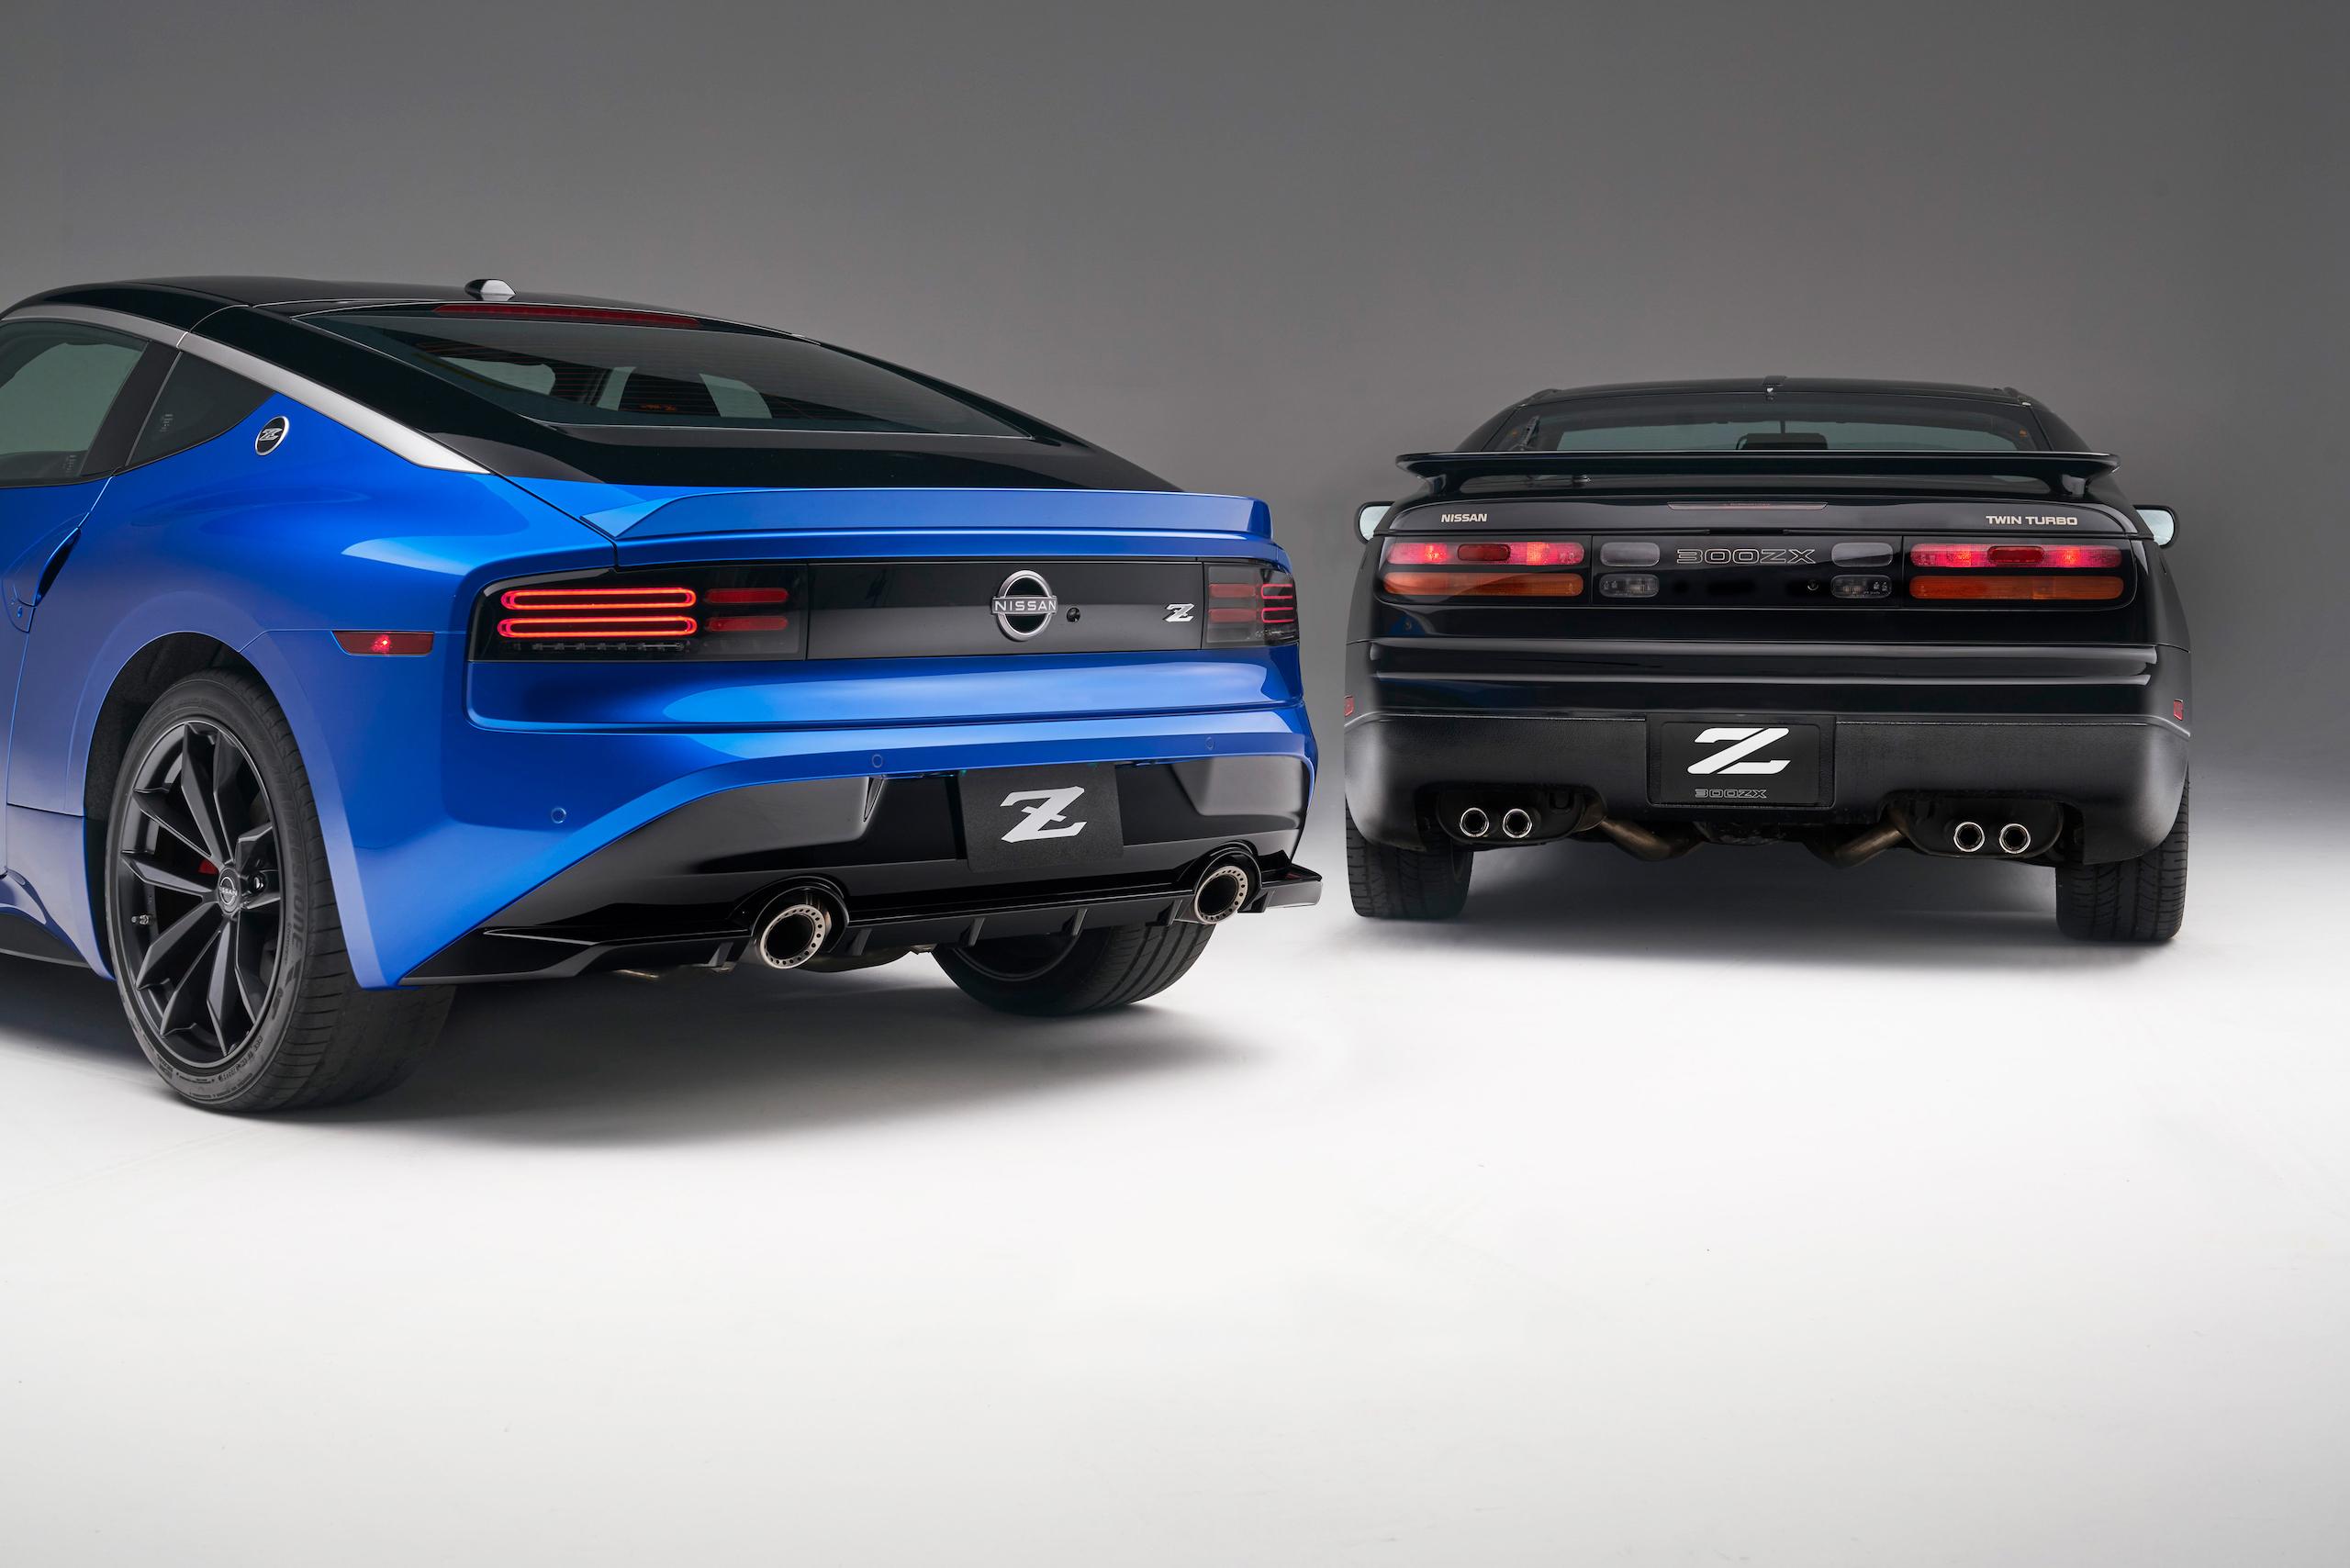 2023 Nissan Z and classic Z rear